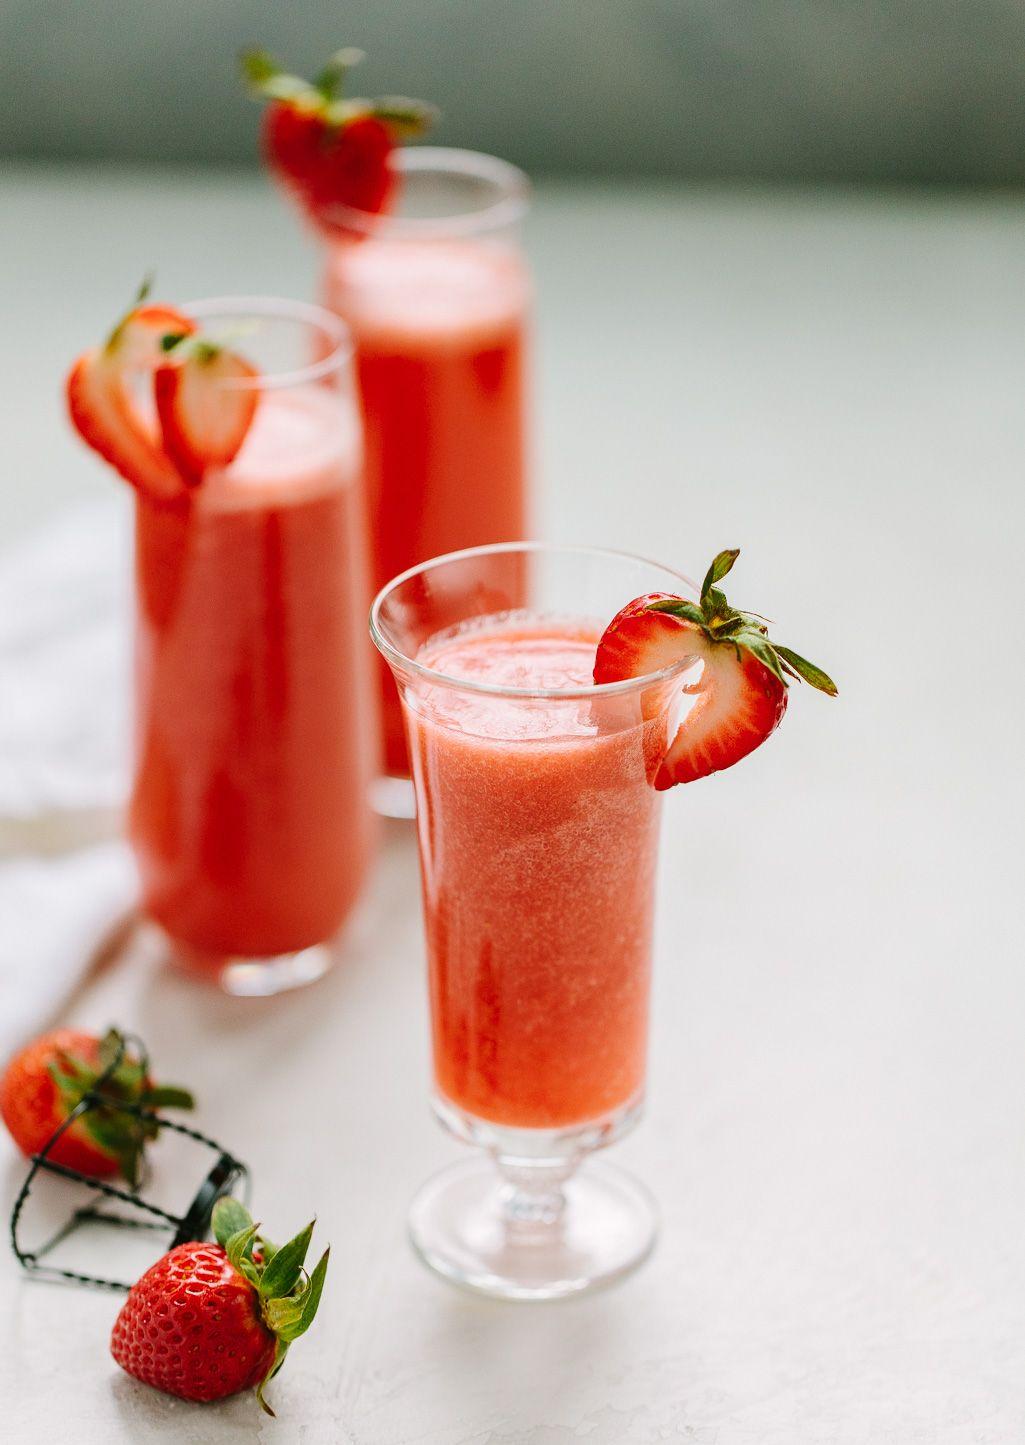 Strawberry Rossini Prosecco Cocktail A Pretty Bubbly Drink Recipe You Can Make With Fresh Strawberries An Prosecco Cocktails Prosecco Cocktail Drinks Recipes